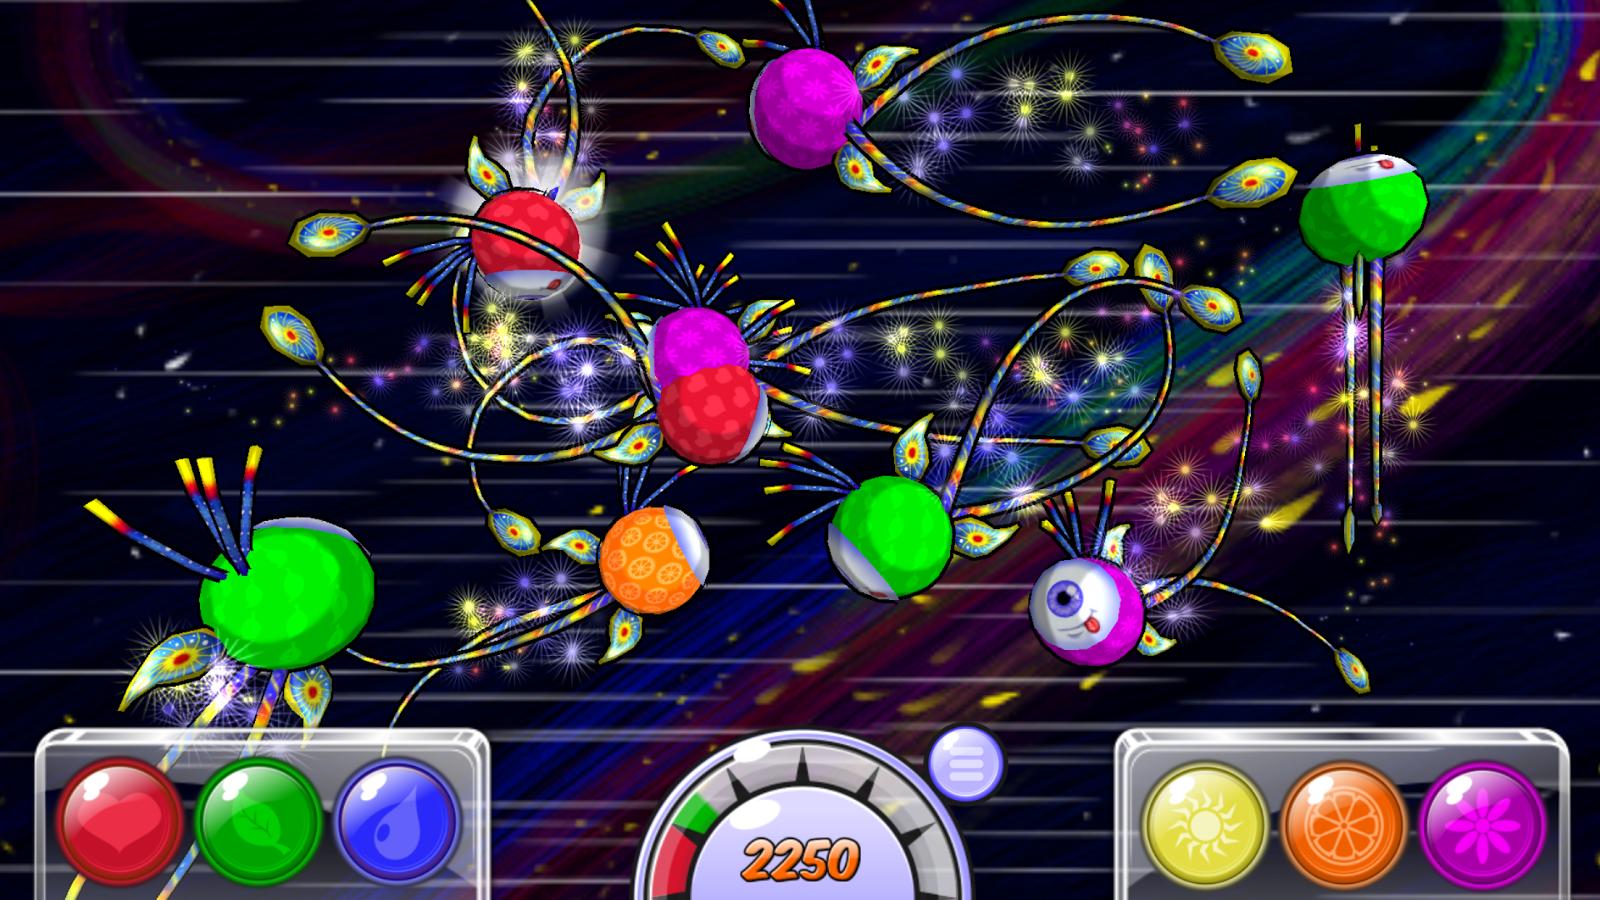 Color Stress Free - στιγμιότυπο οθόνης